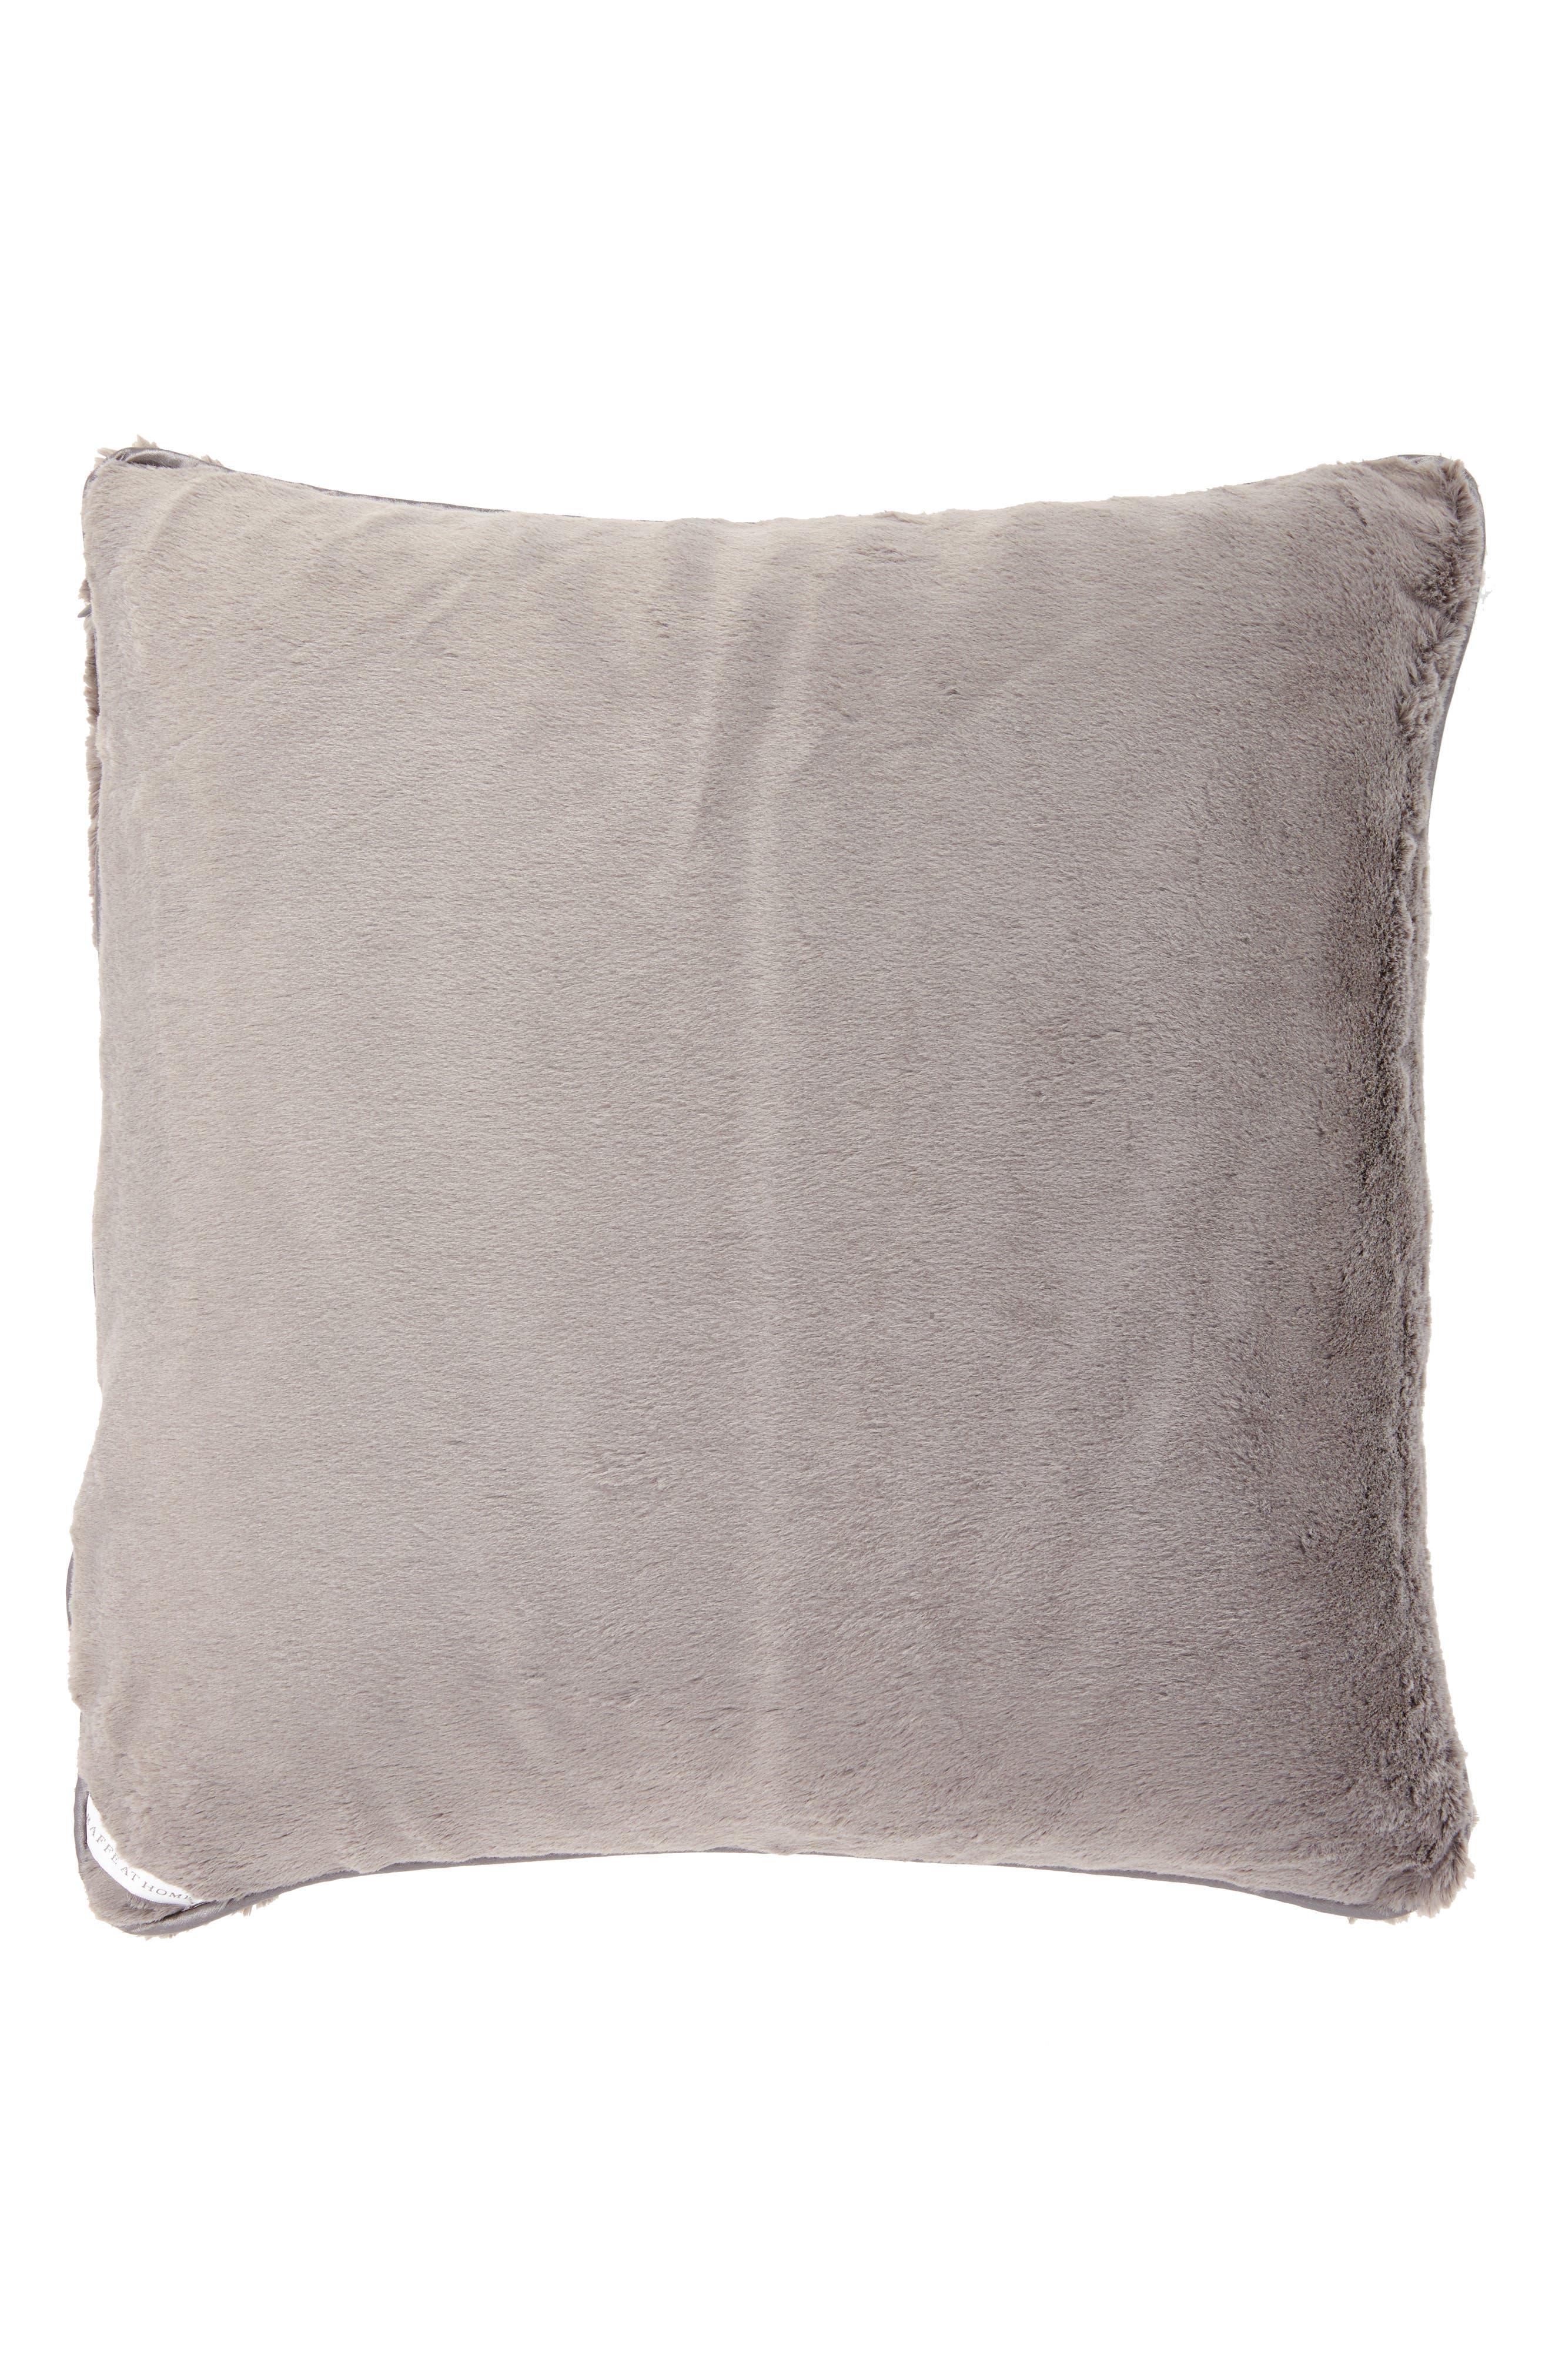 GIRAFFE AT HOME, 'Luxe' Throw Pillow, Main thumbnail 1, color, CHARCOAL